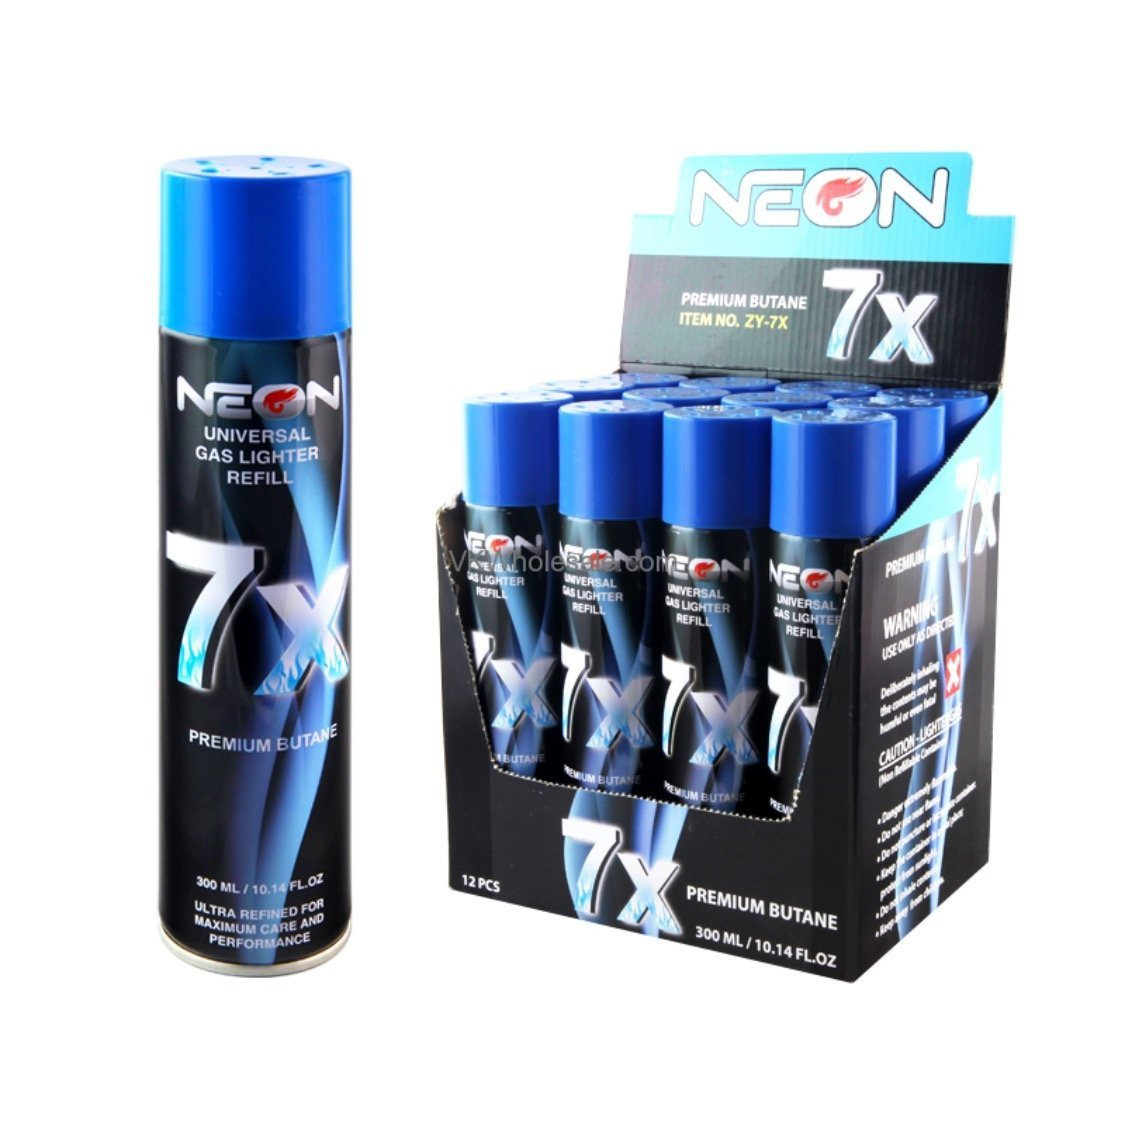 Neon 7X Butane Fuel 12 Pack